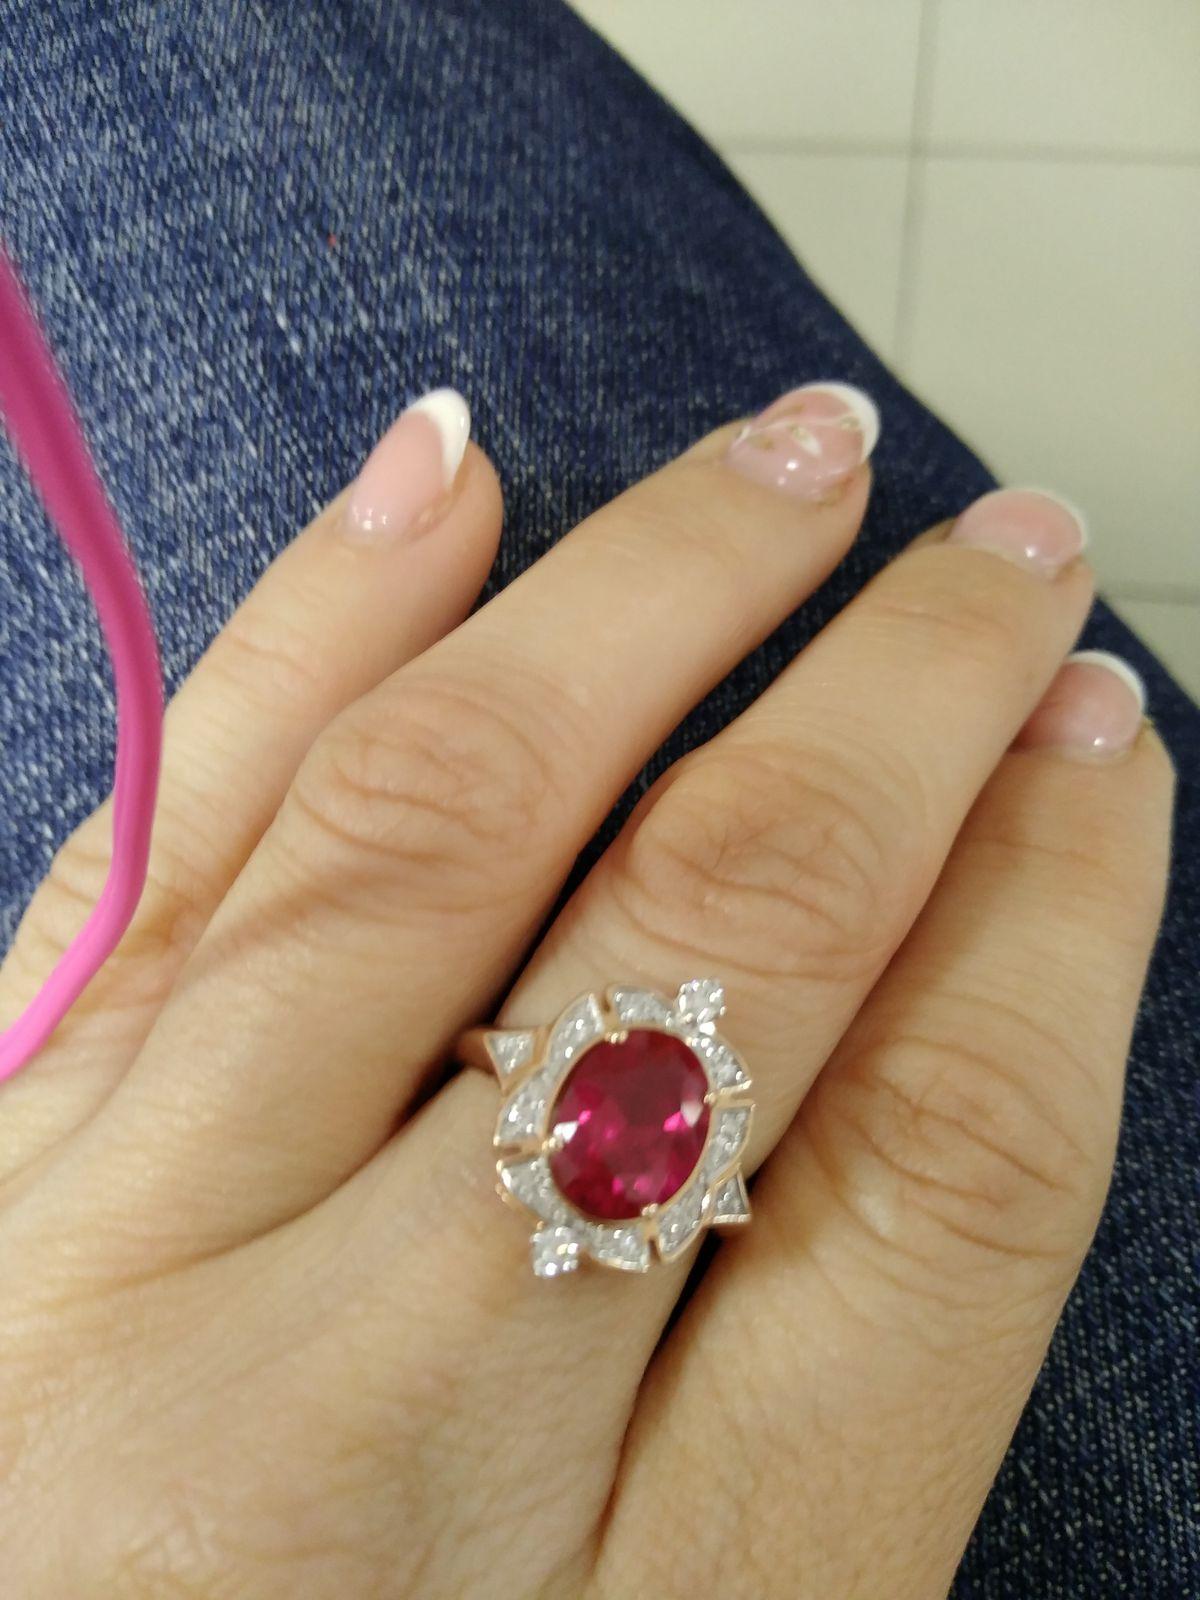 Кольцо с рубином и бриллиантами))